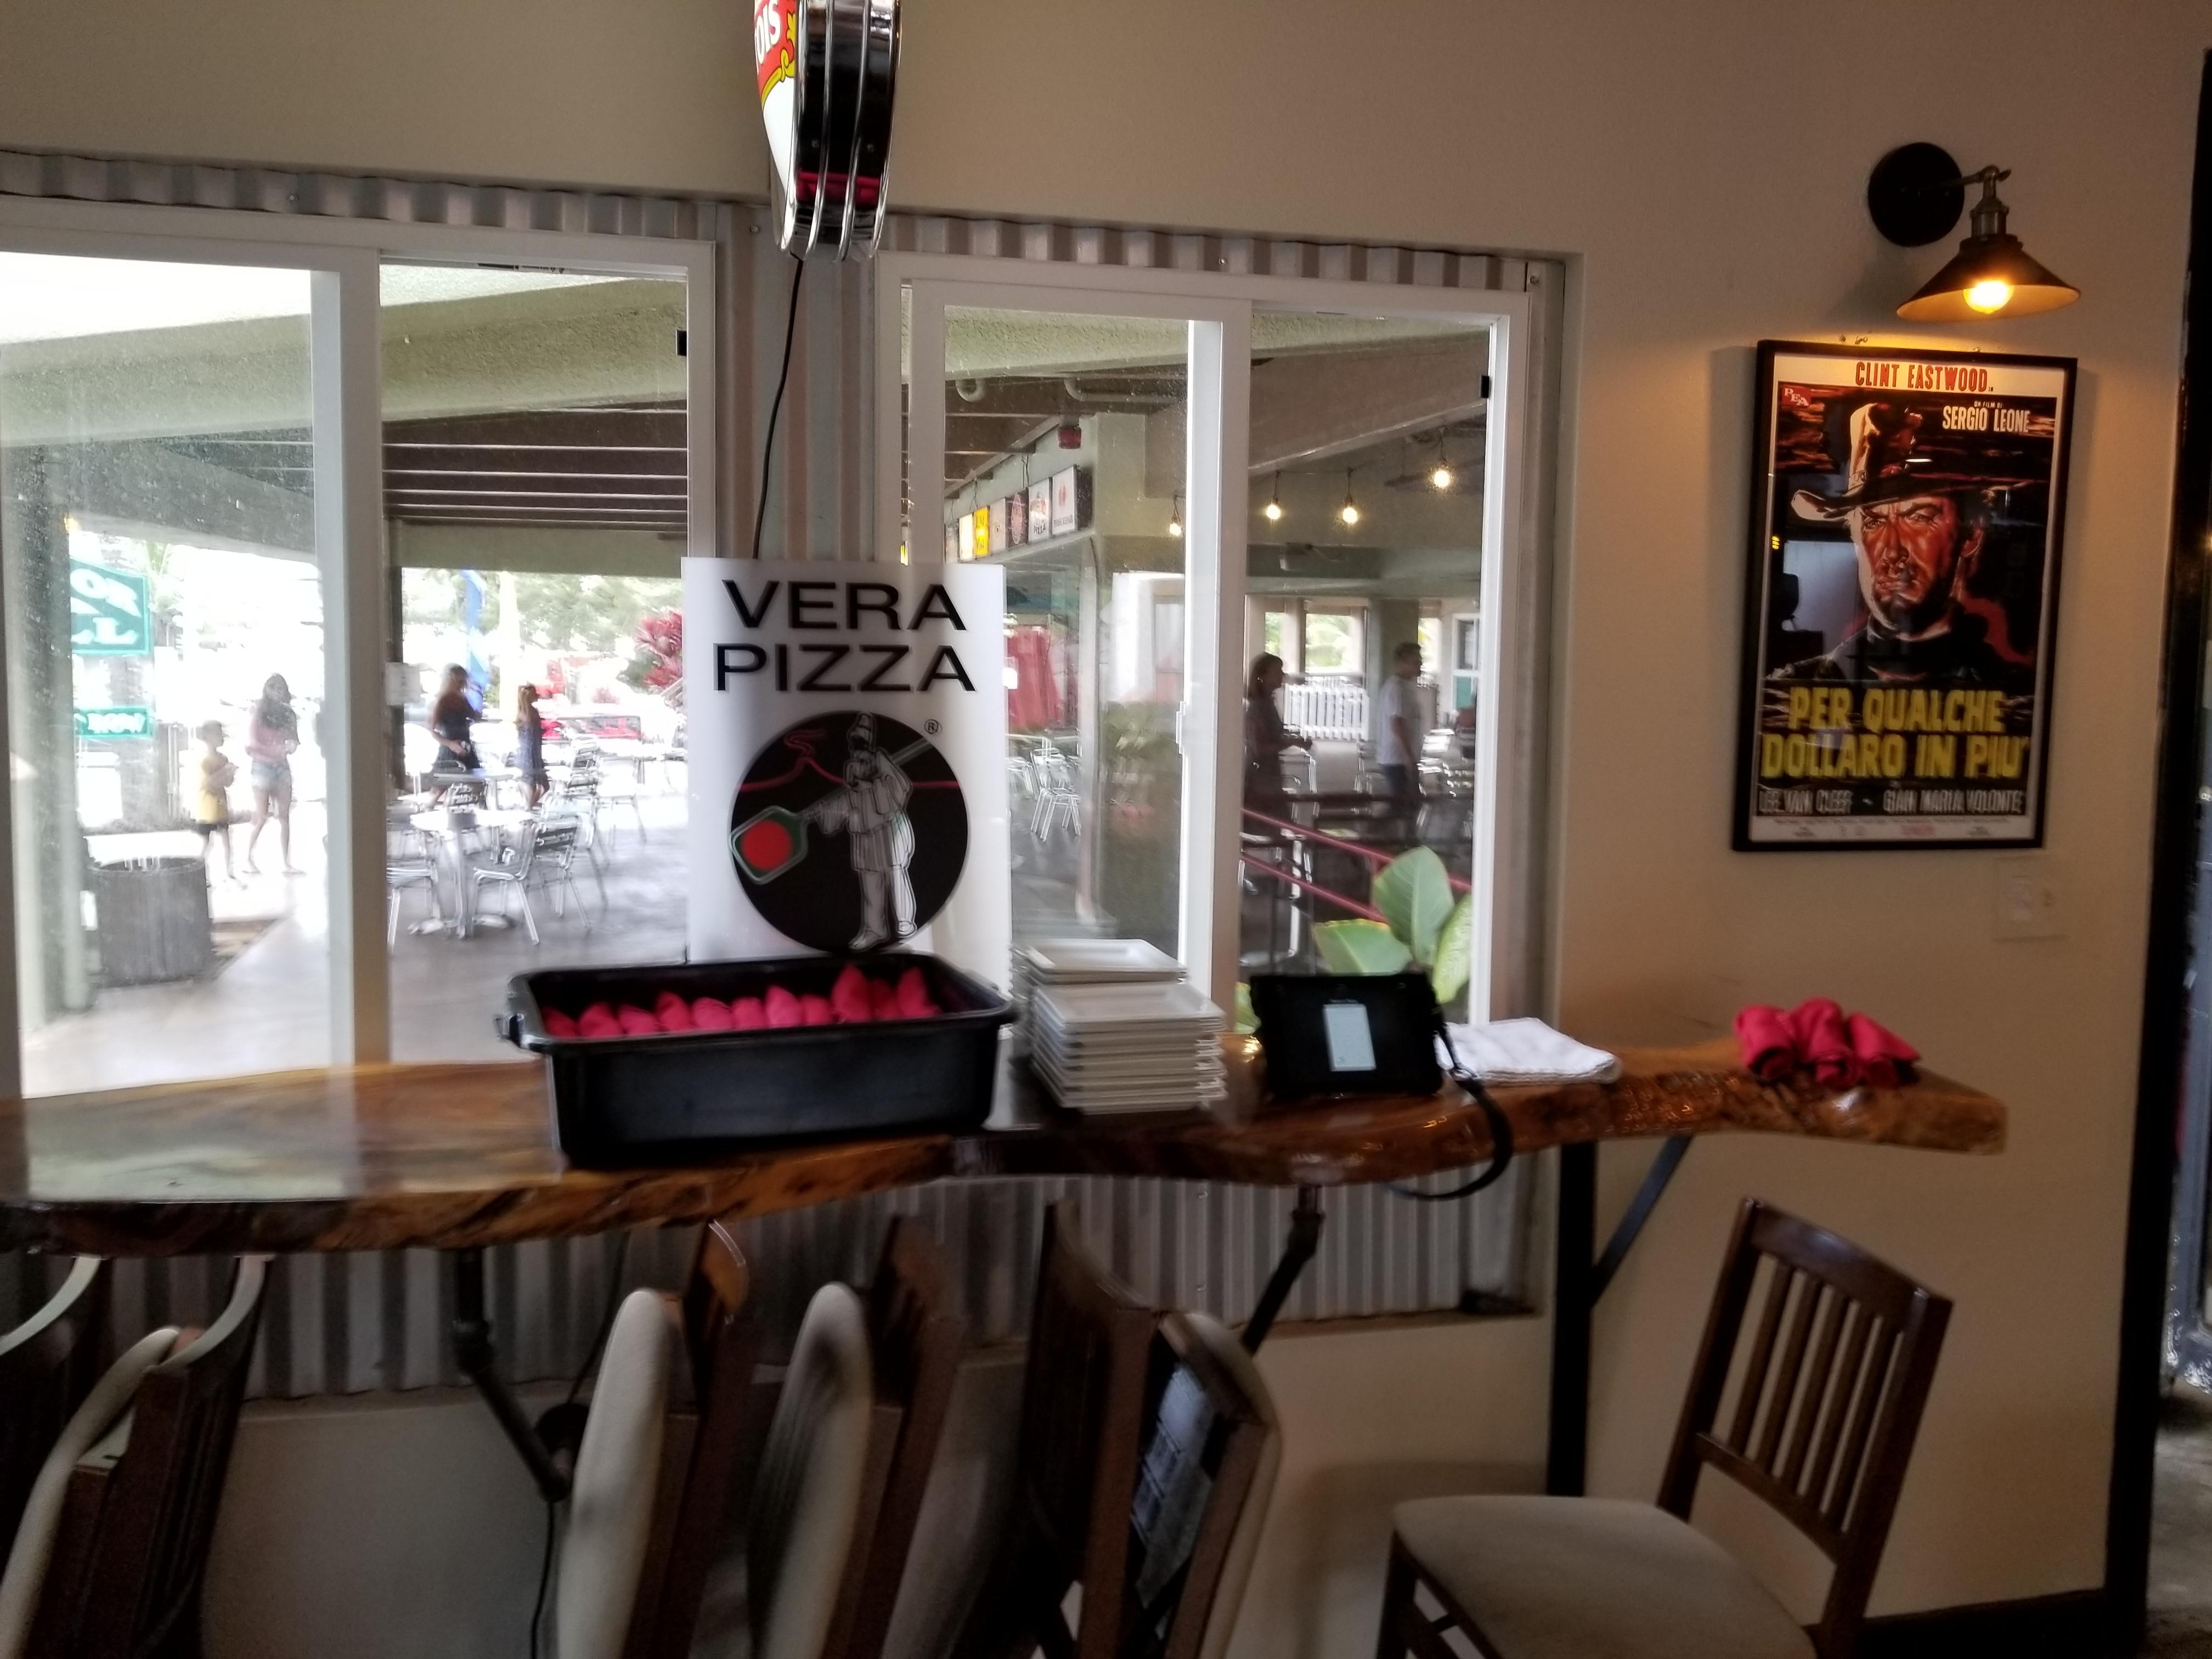 VERA Certified Pizza